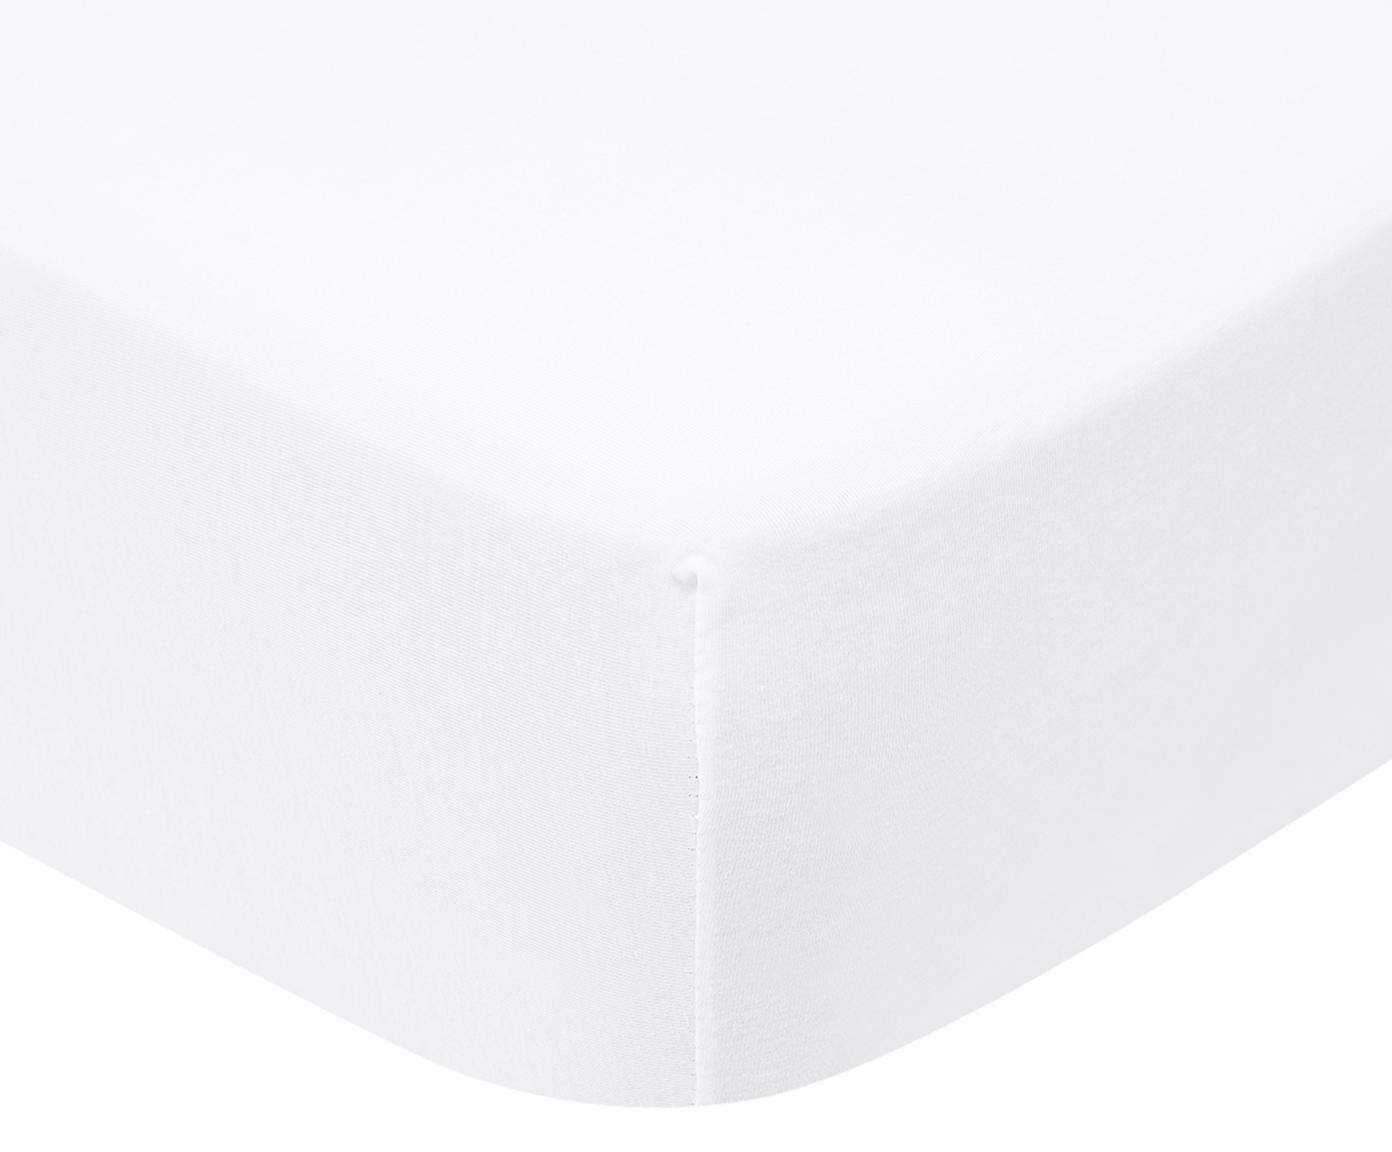 Sábana bajera para boxspring de jersey con elastano Lara, 95%algodón, 5%elastano, Blanco, Cama 90 cm (90-100 x 200 cm)